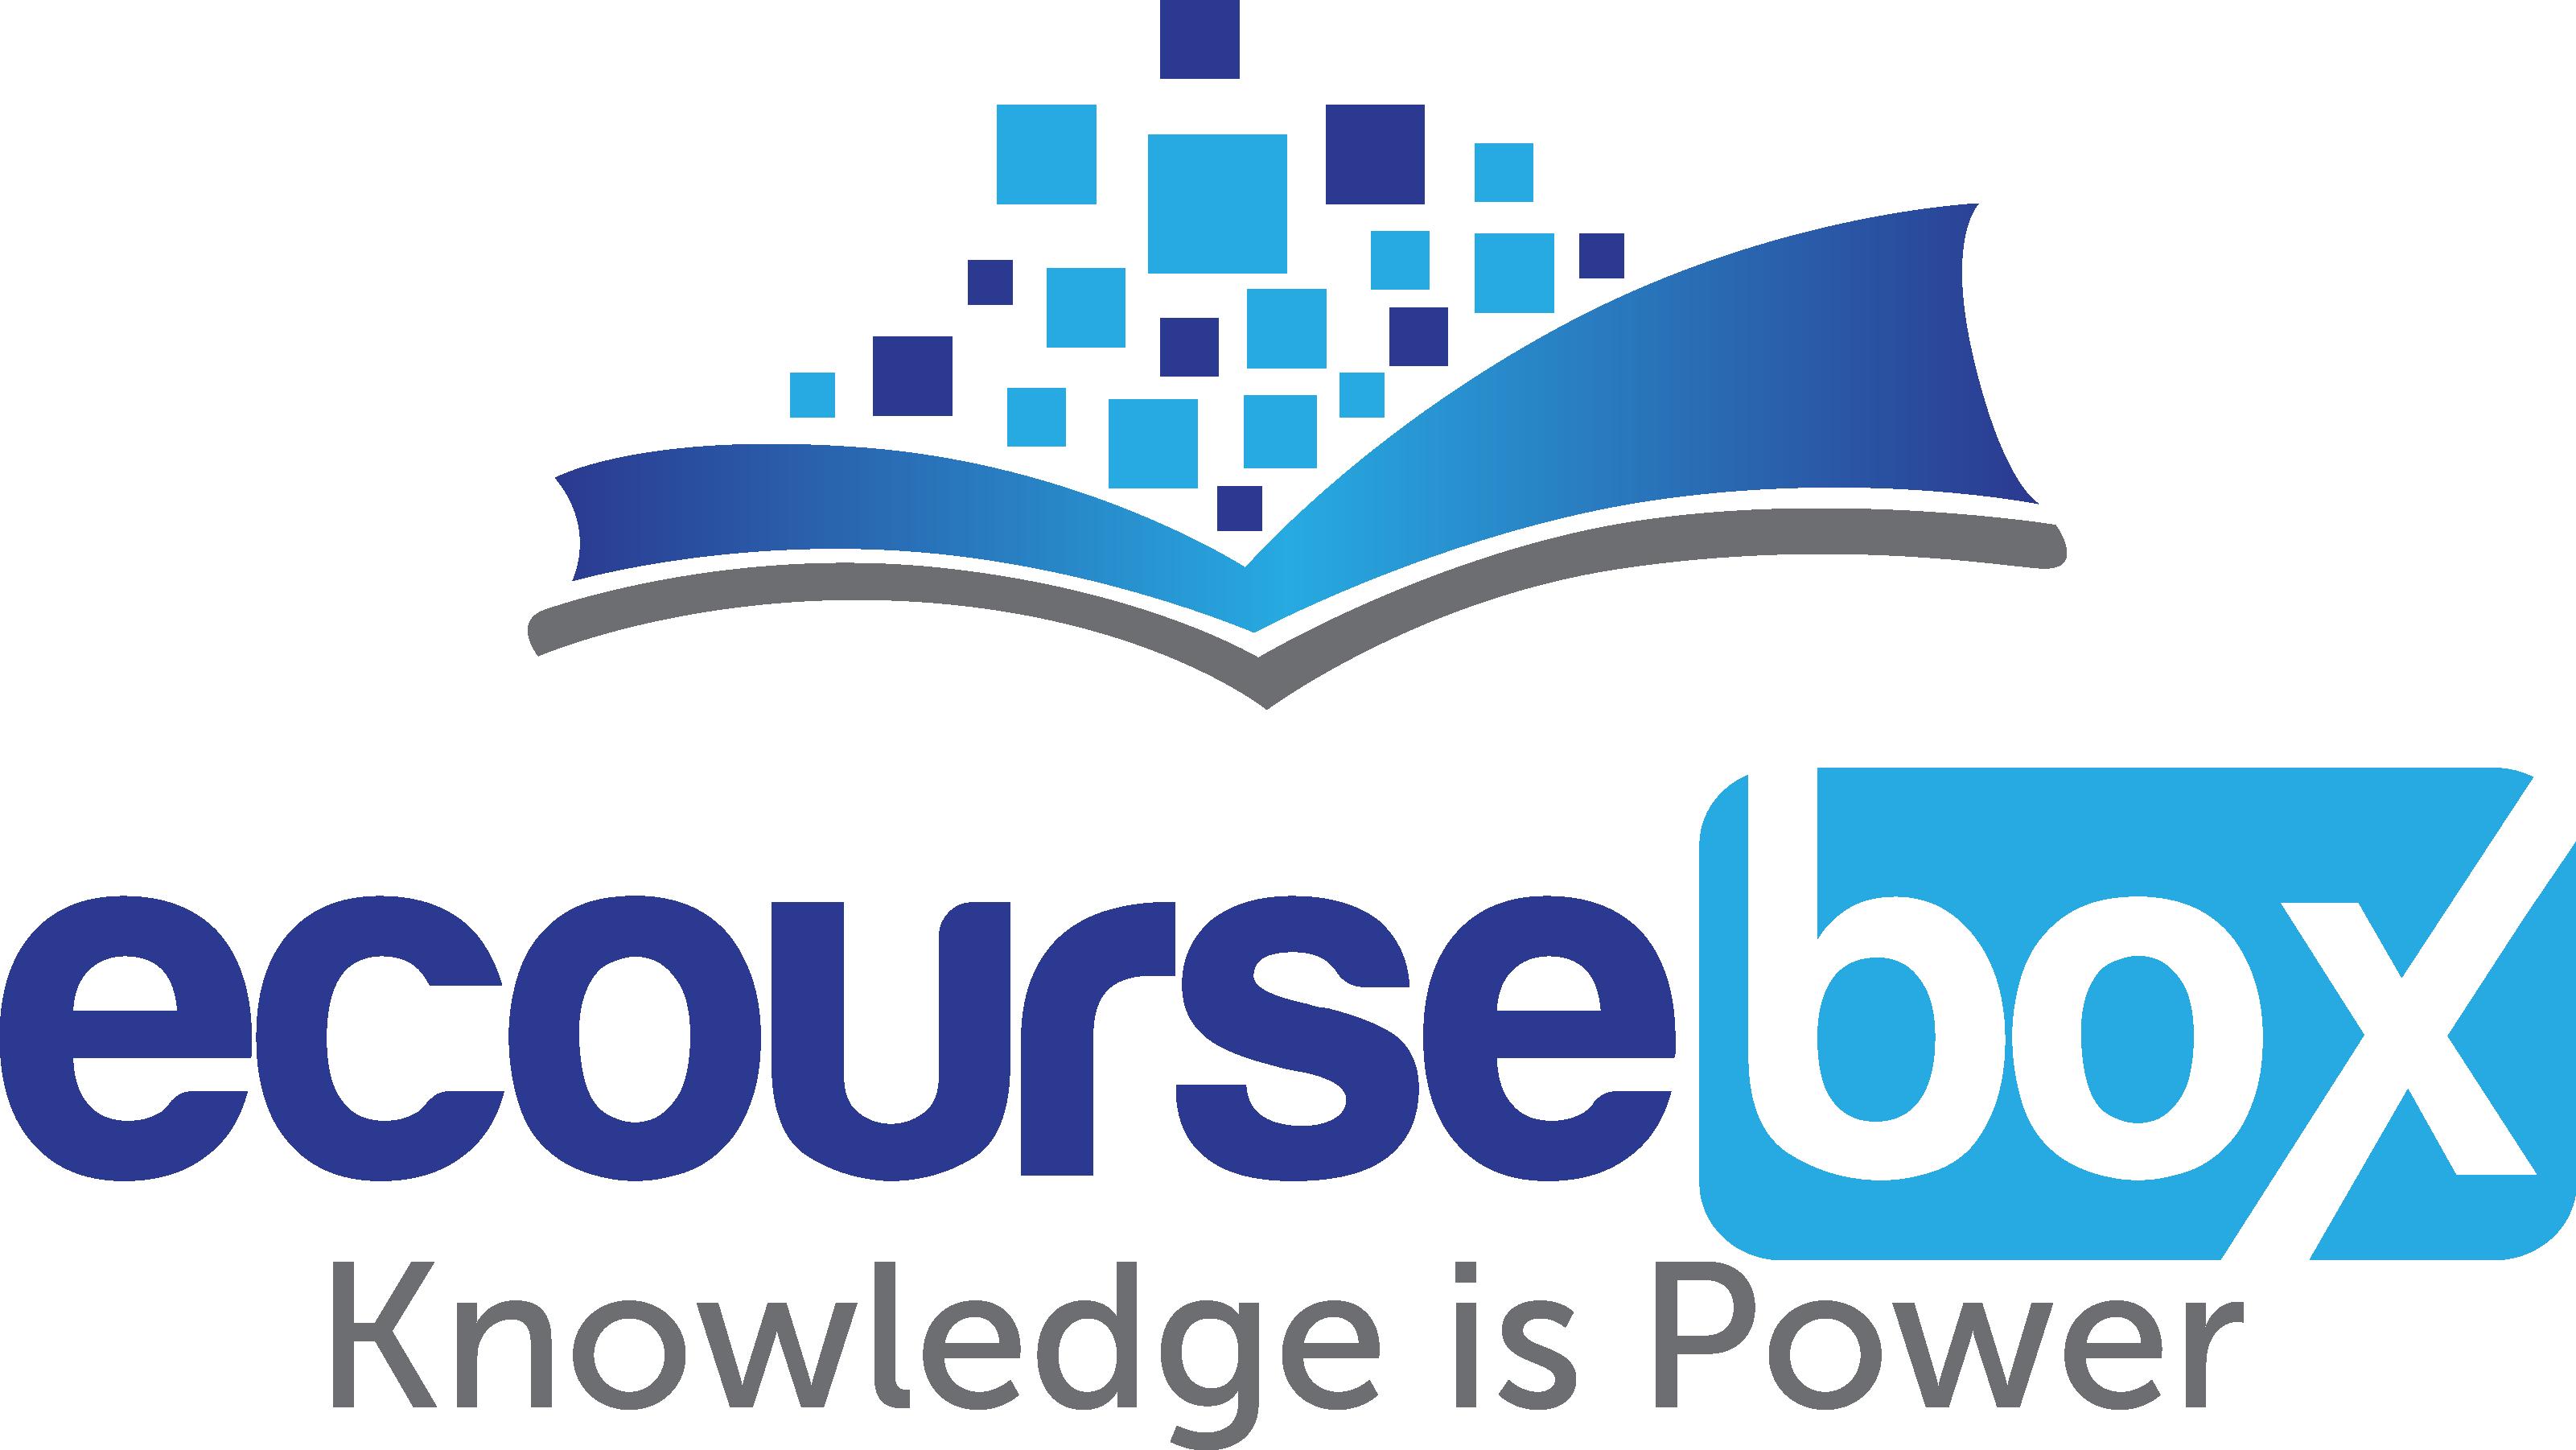 Ecoursebox منصة تعليمية فكرة مبتكرة حدثنا عن فكـرة مشــروعك الأساسيــة اشــرح كل ما تريد أن تقول Create Your Website This Or That Questions Online Education